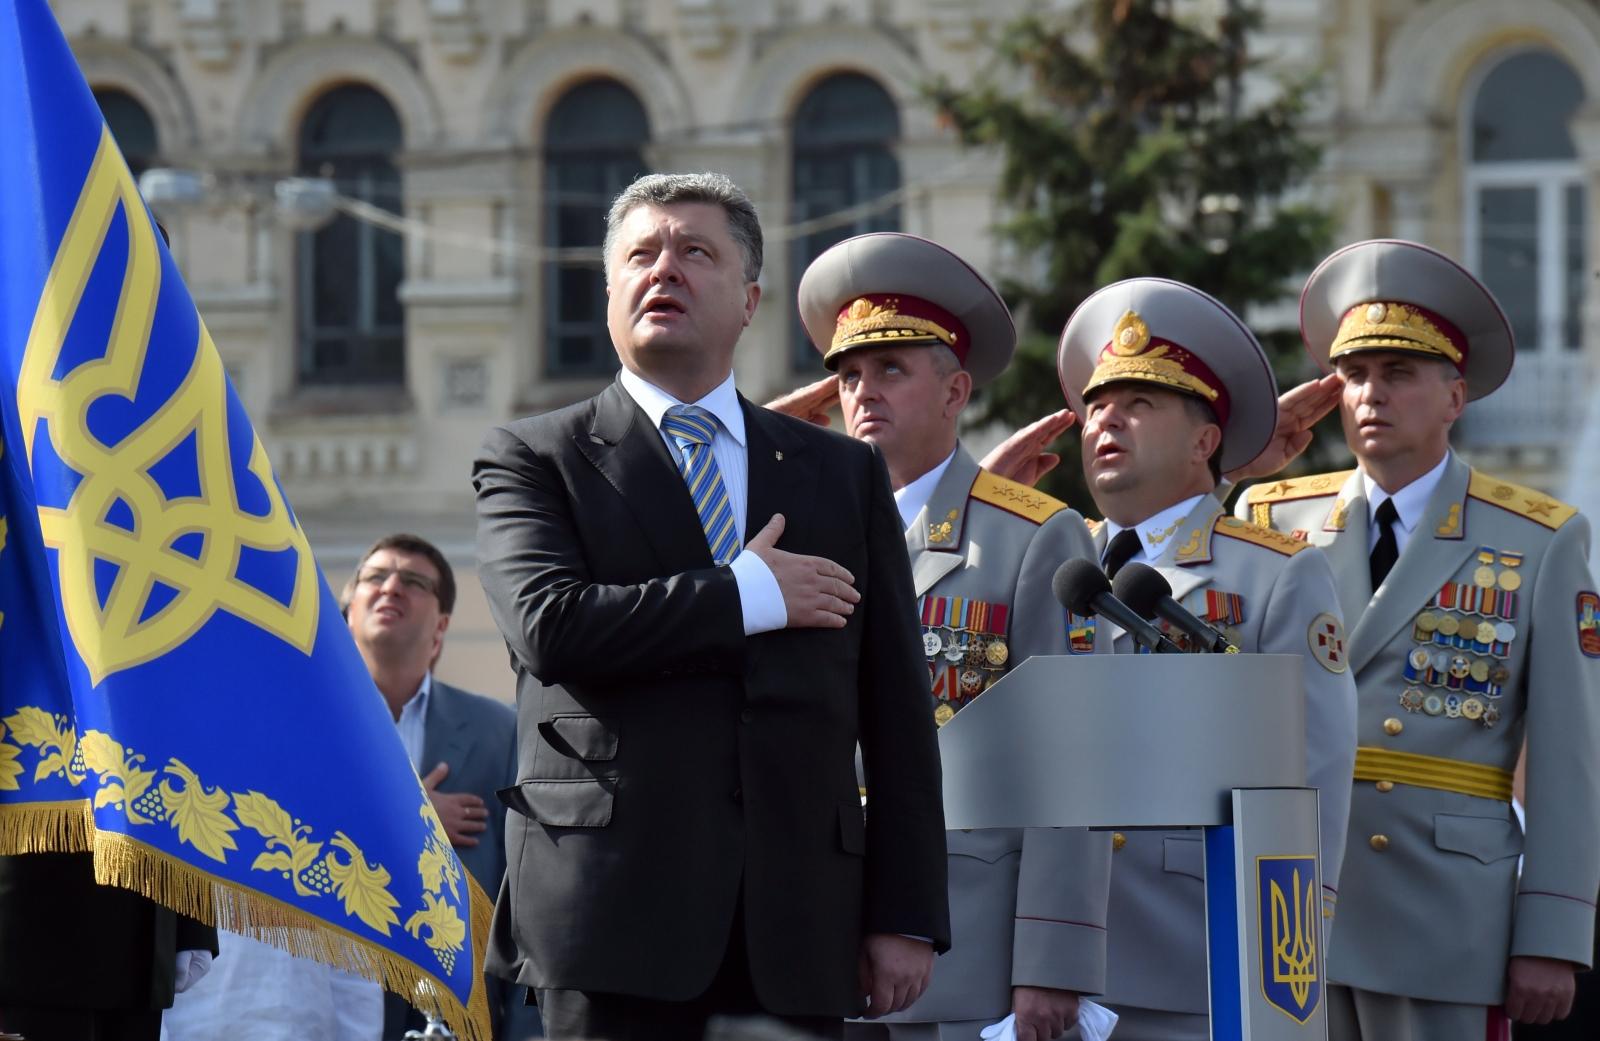 Ukraine Independence Day Parade President Poroshenko